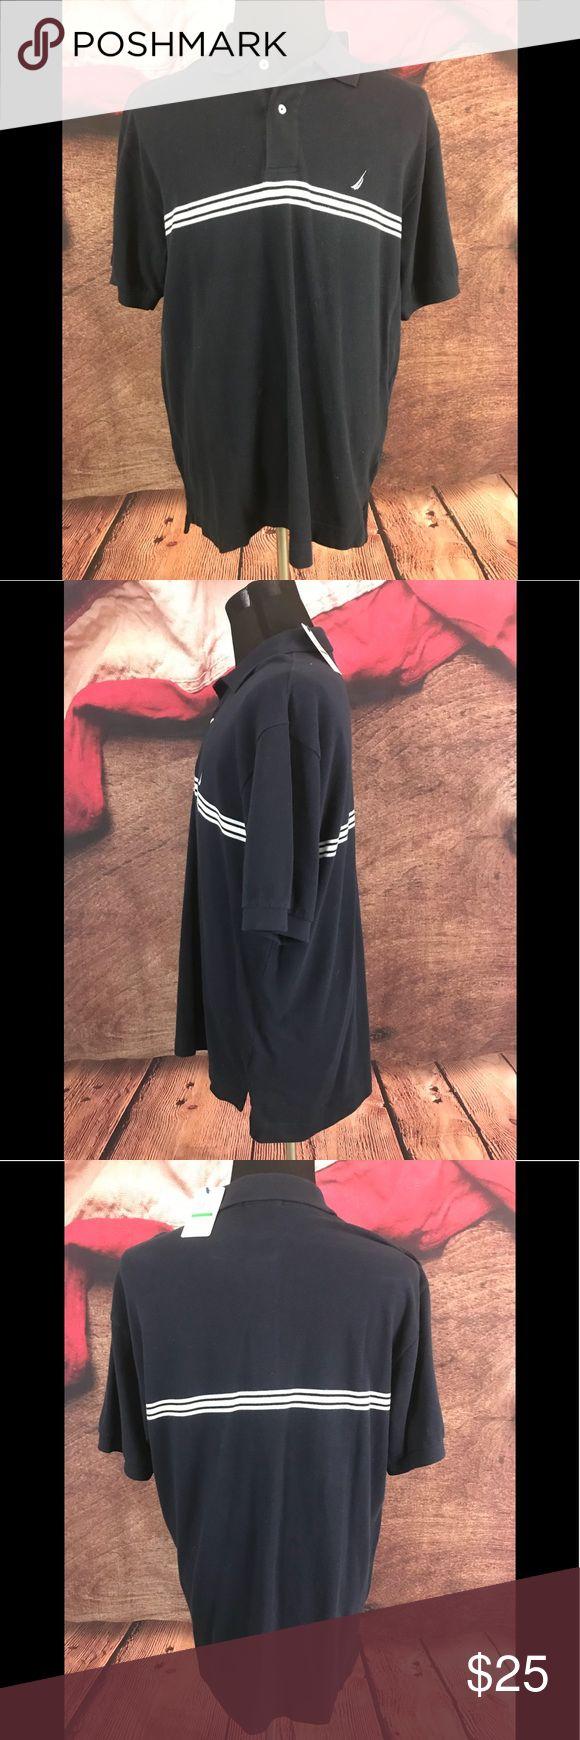 "Nautica Mens Blue Striped Cotton Polo Shirt Large New With Tags Nautica Mens Blue Striped Cotton Polo Shirt Size Large   Size: Large Material: 100% Cotton Color: Blue Measurements: Chest: 23"" / Shoulders: 20"" / Sleeve: 10"" / Length: 28"" Nautica Shirts Polos"